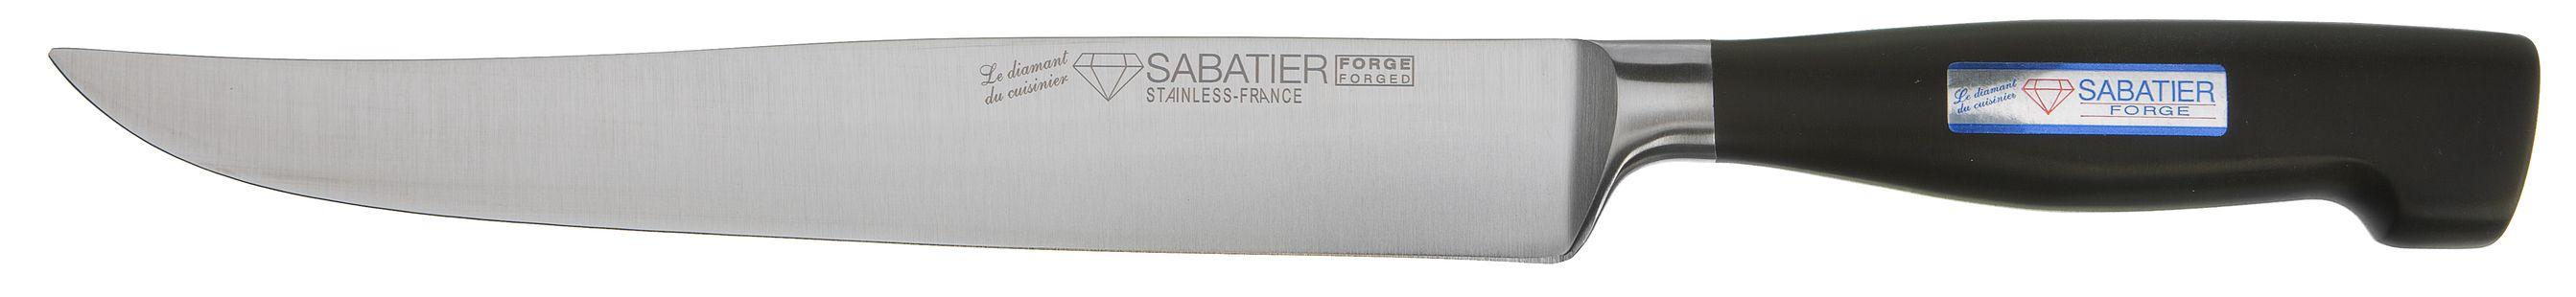 diamant_sabatier_trancheermes_forge_20_cm.jpg